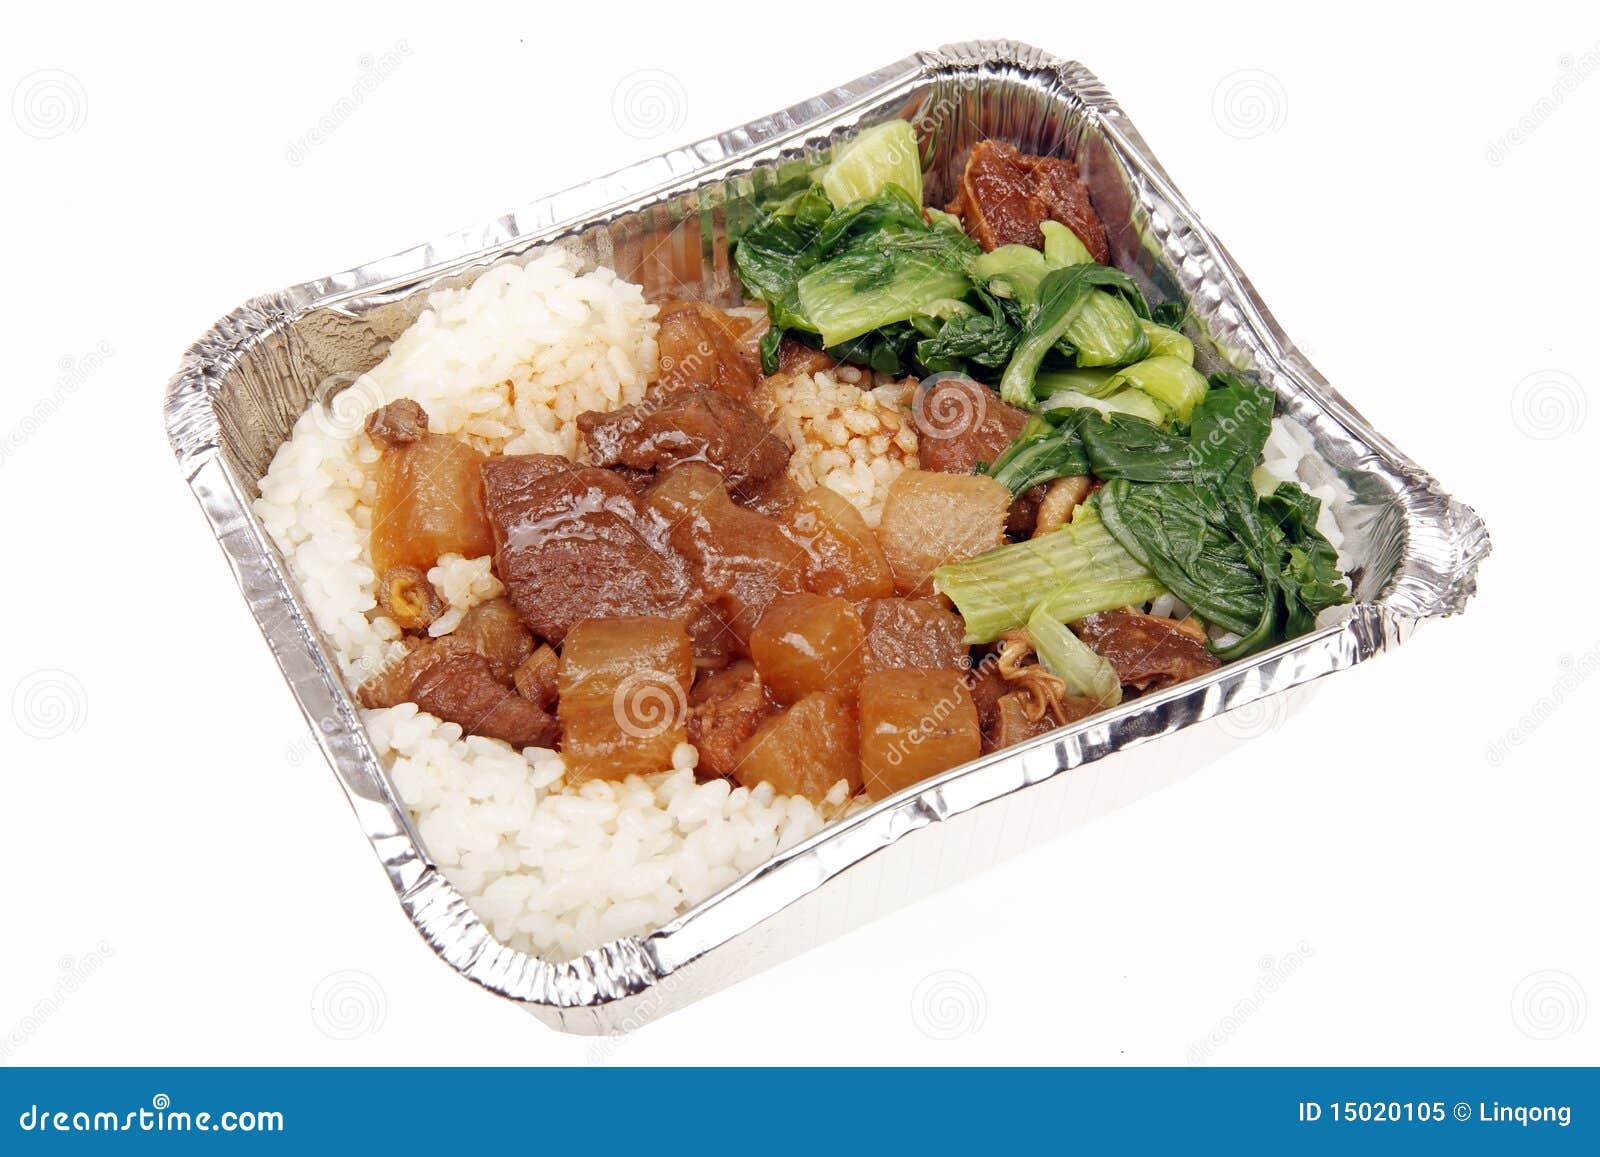 https://thumbs.dreamstime.com/z/chinese-fast-food-15020105.jpg